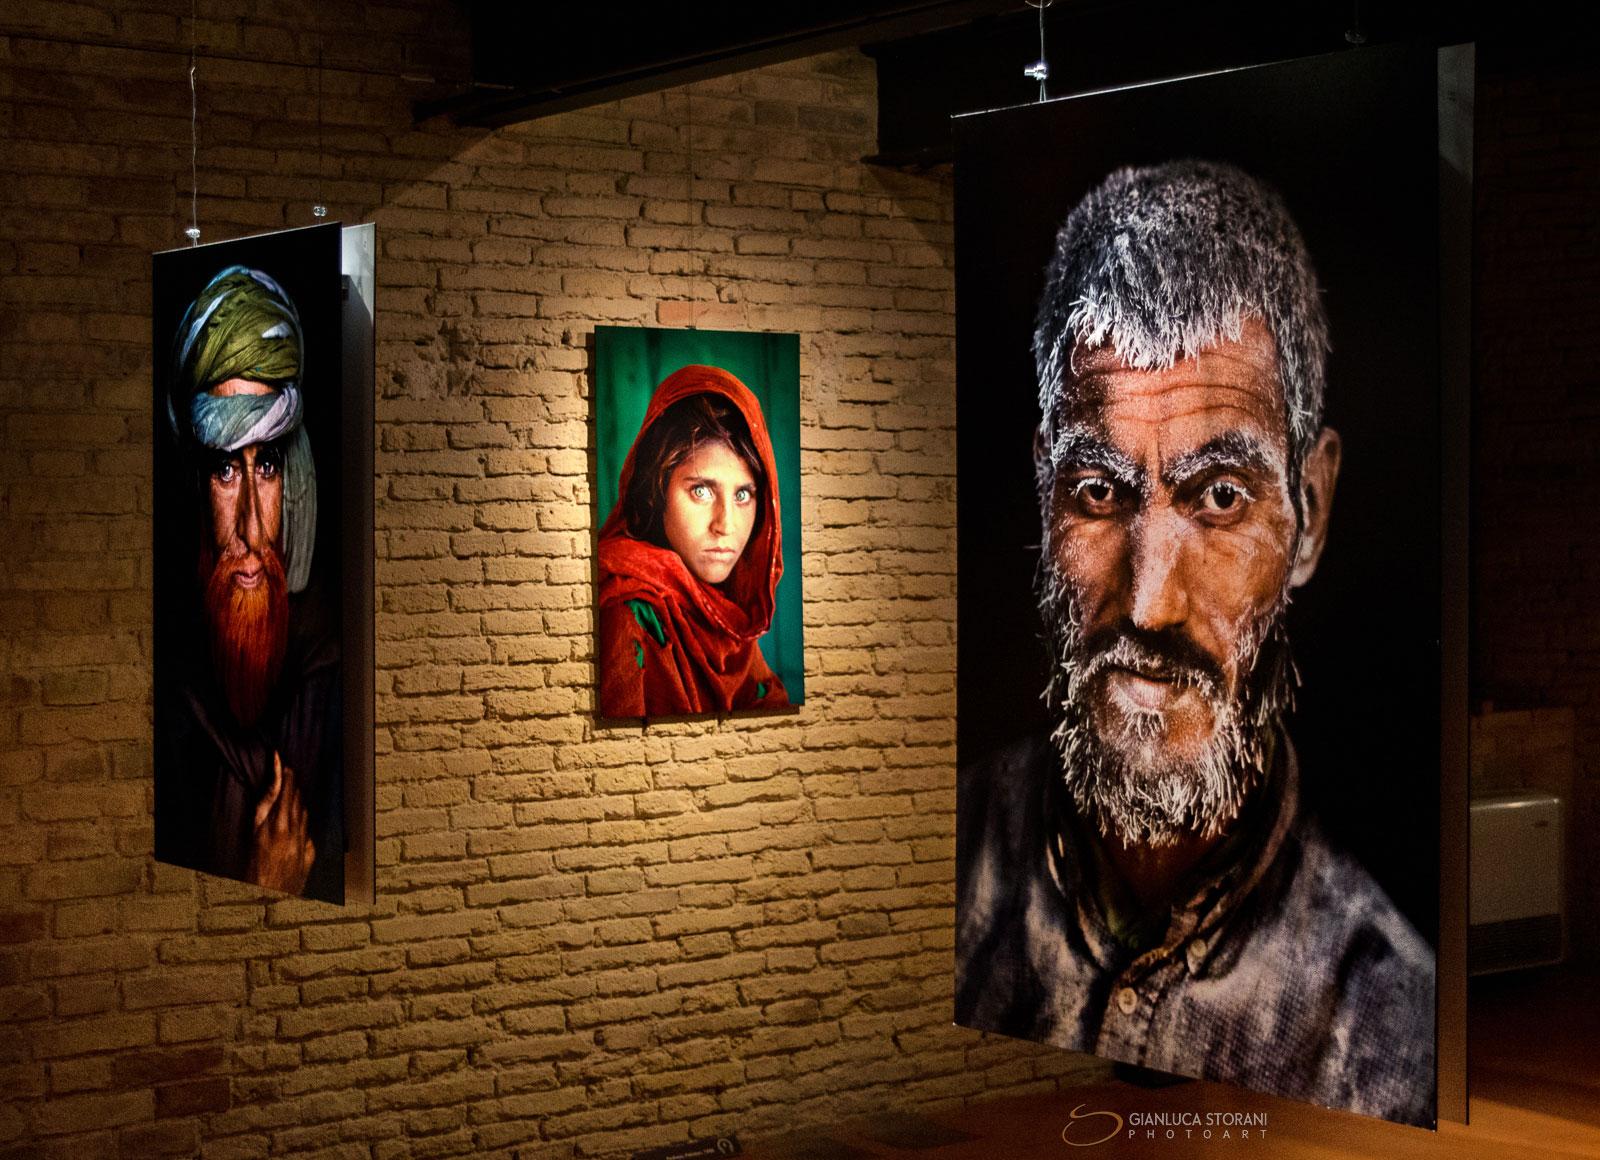 Steve MuCurry Icons alla Mole di Ancona (ID: 3-9075)